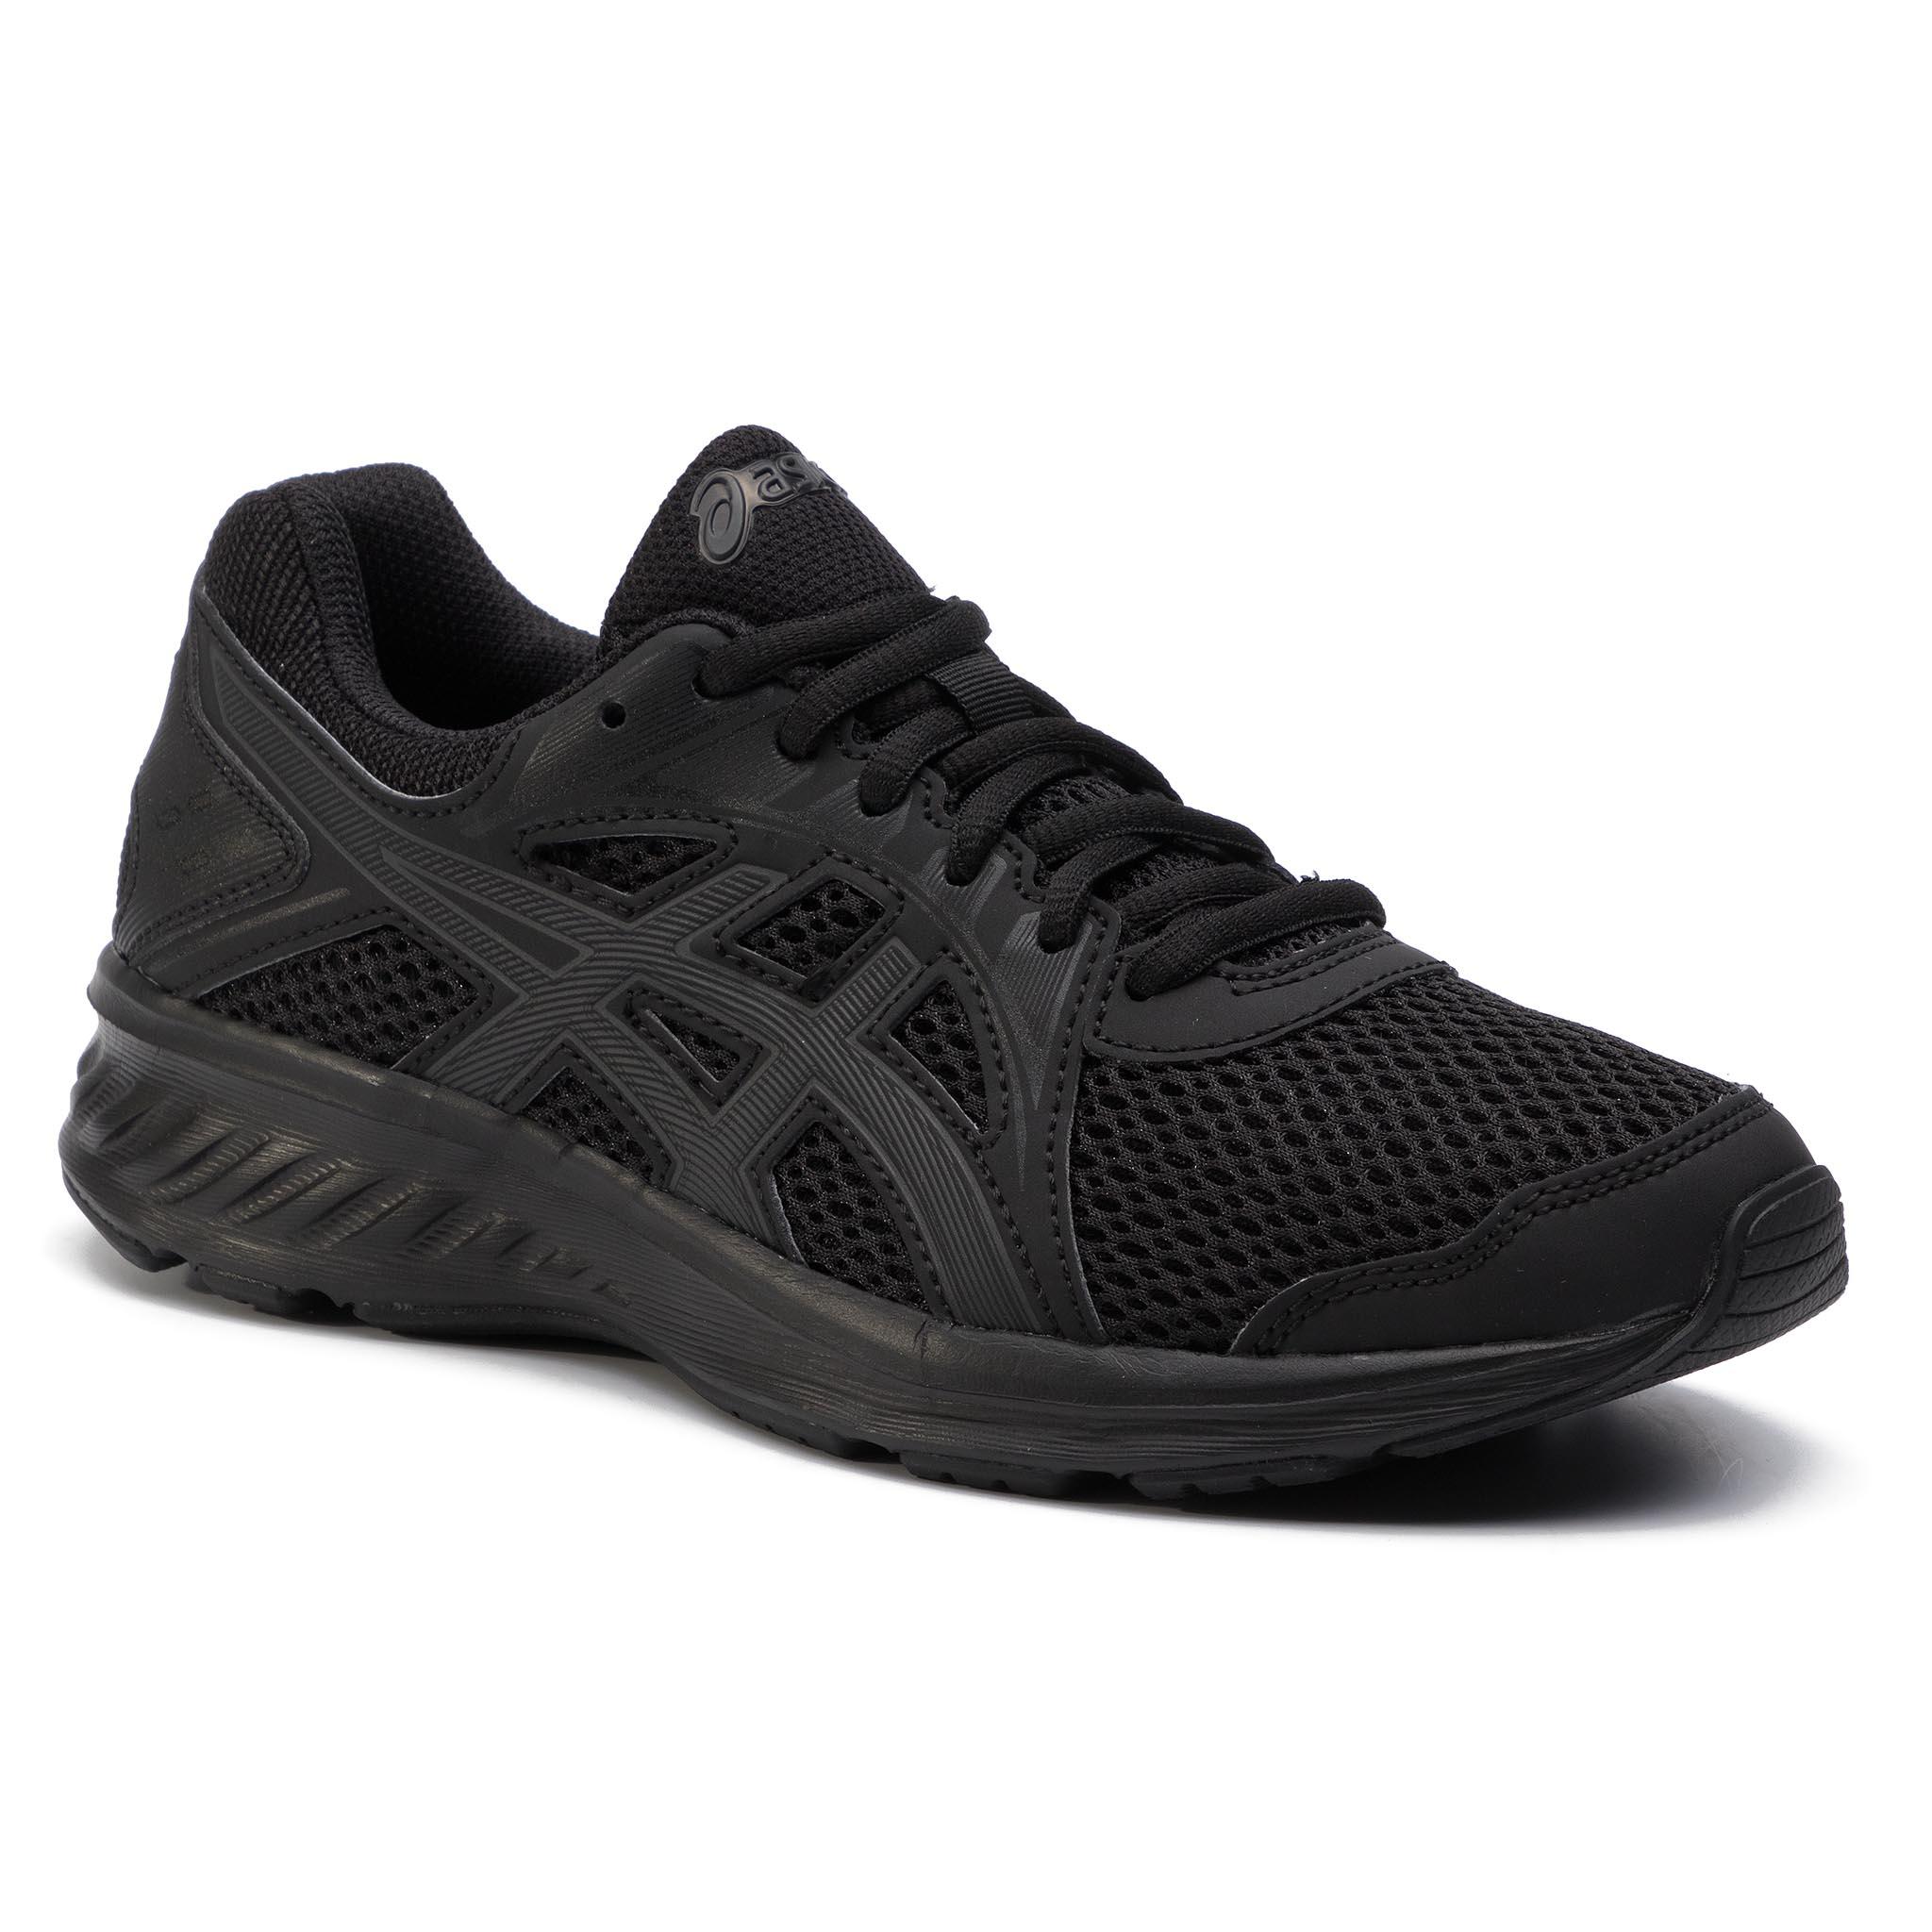 Shoes ASICS Gel Braid 1012A629 BlackSun Coral 001